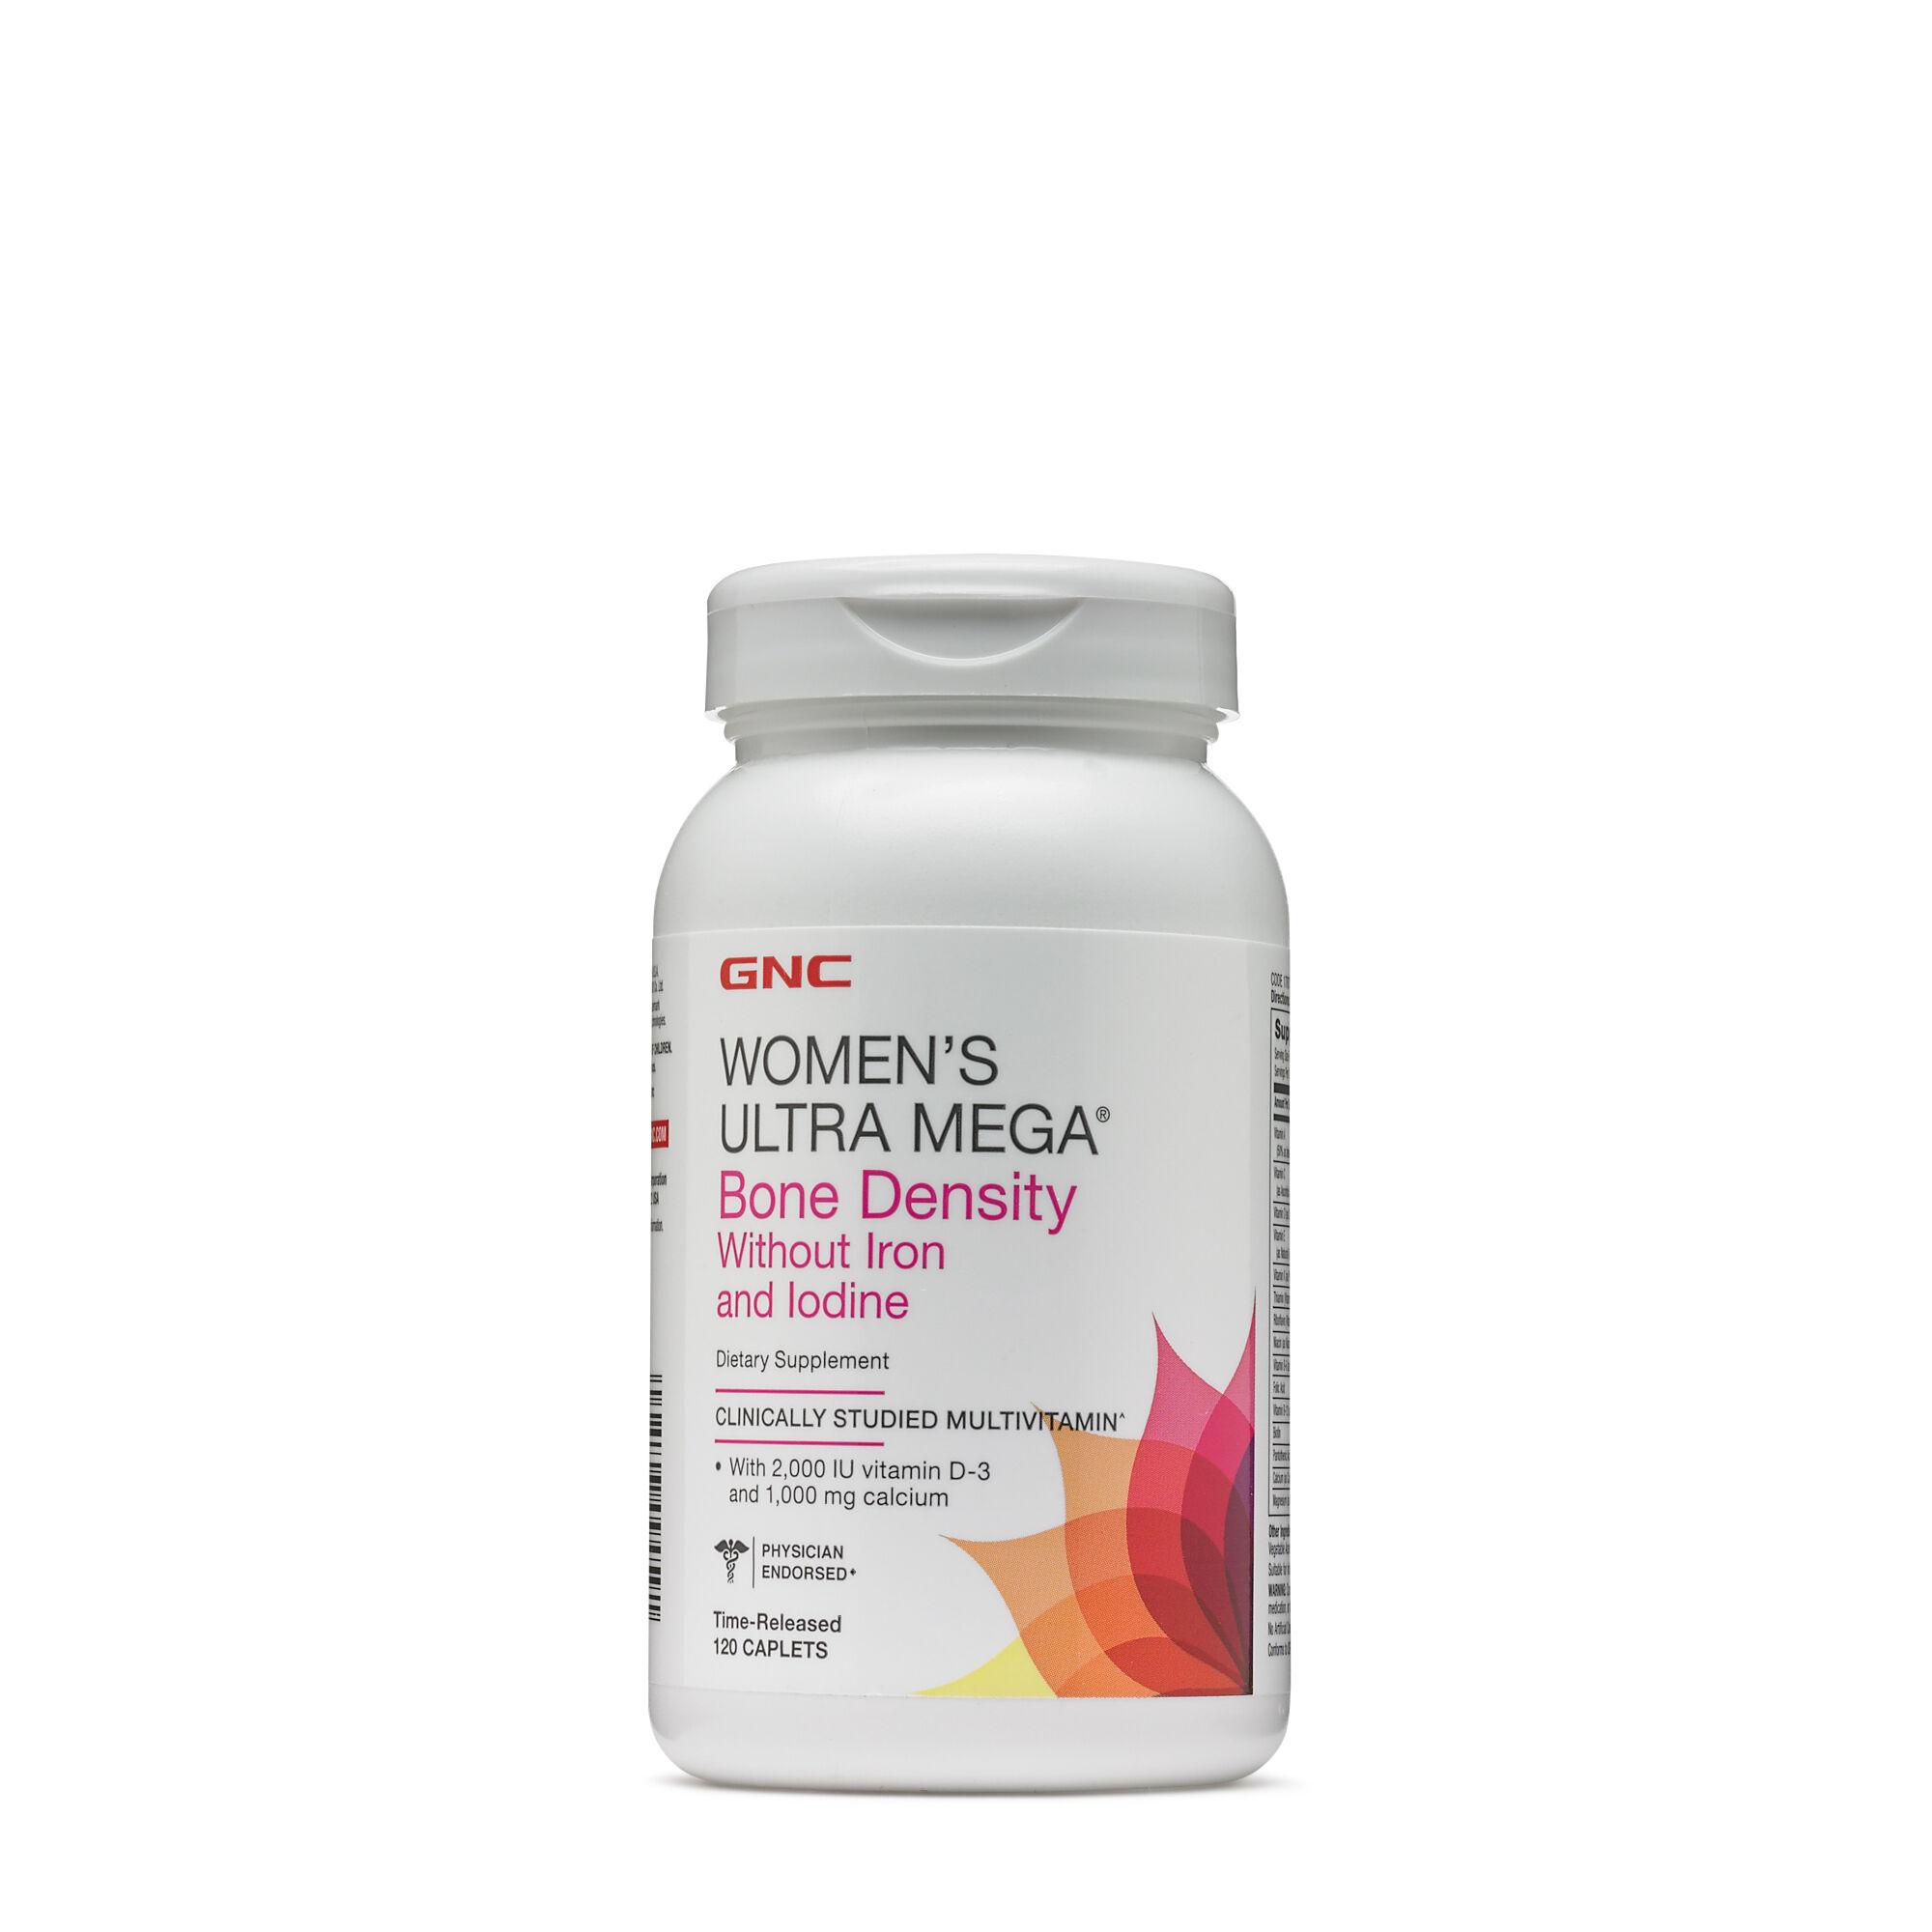 Best Womens Multivitamin 2020.Gnc Women S Ultra Mega Bone Density Without Iron And Iodine